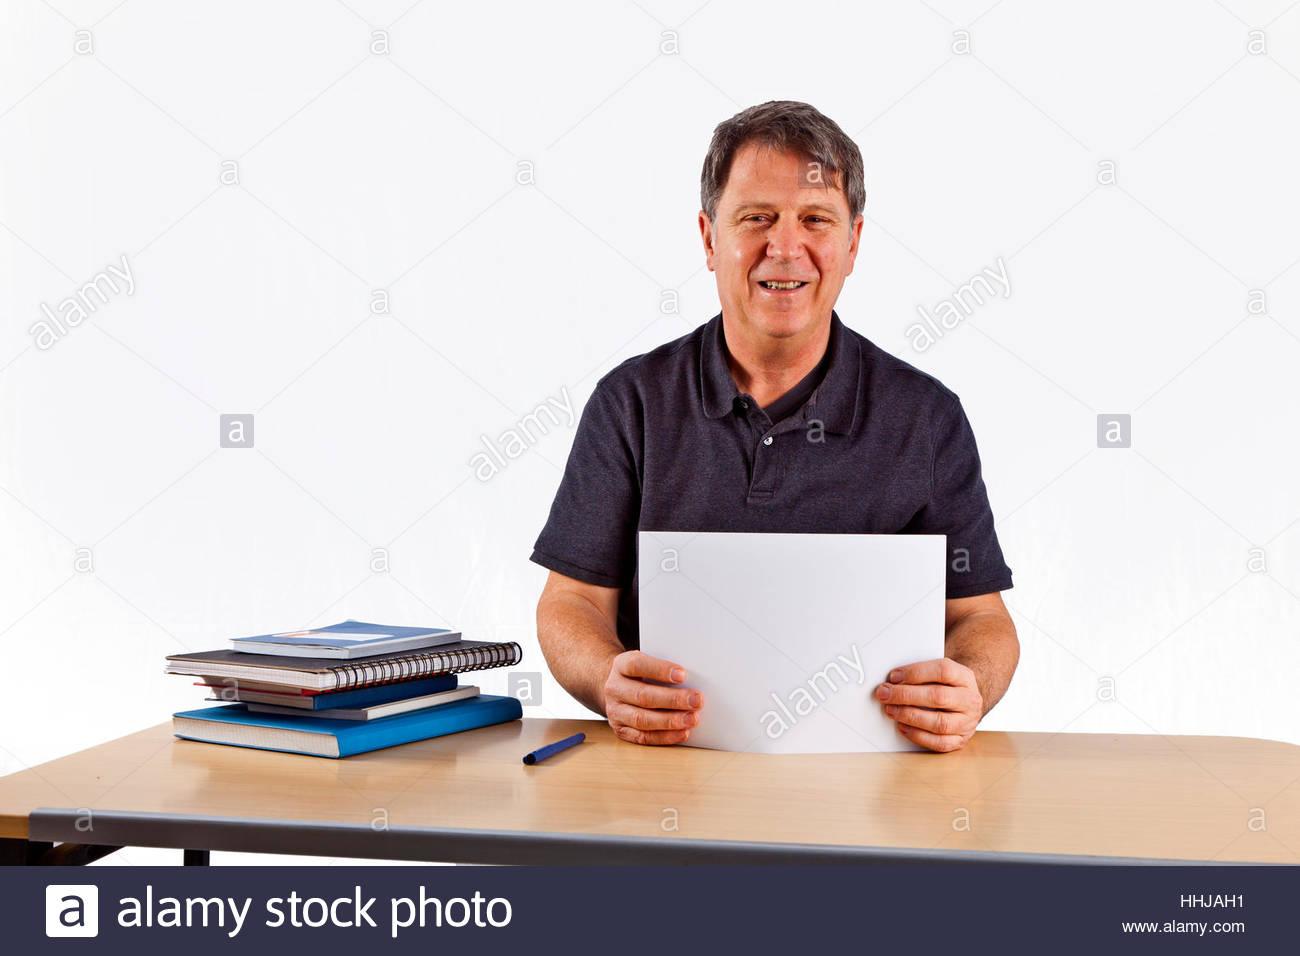 office, desk, person, business dealings, deal, business transaction,  business,